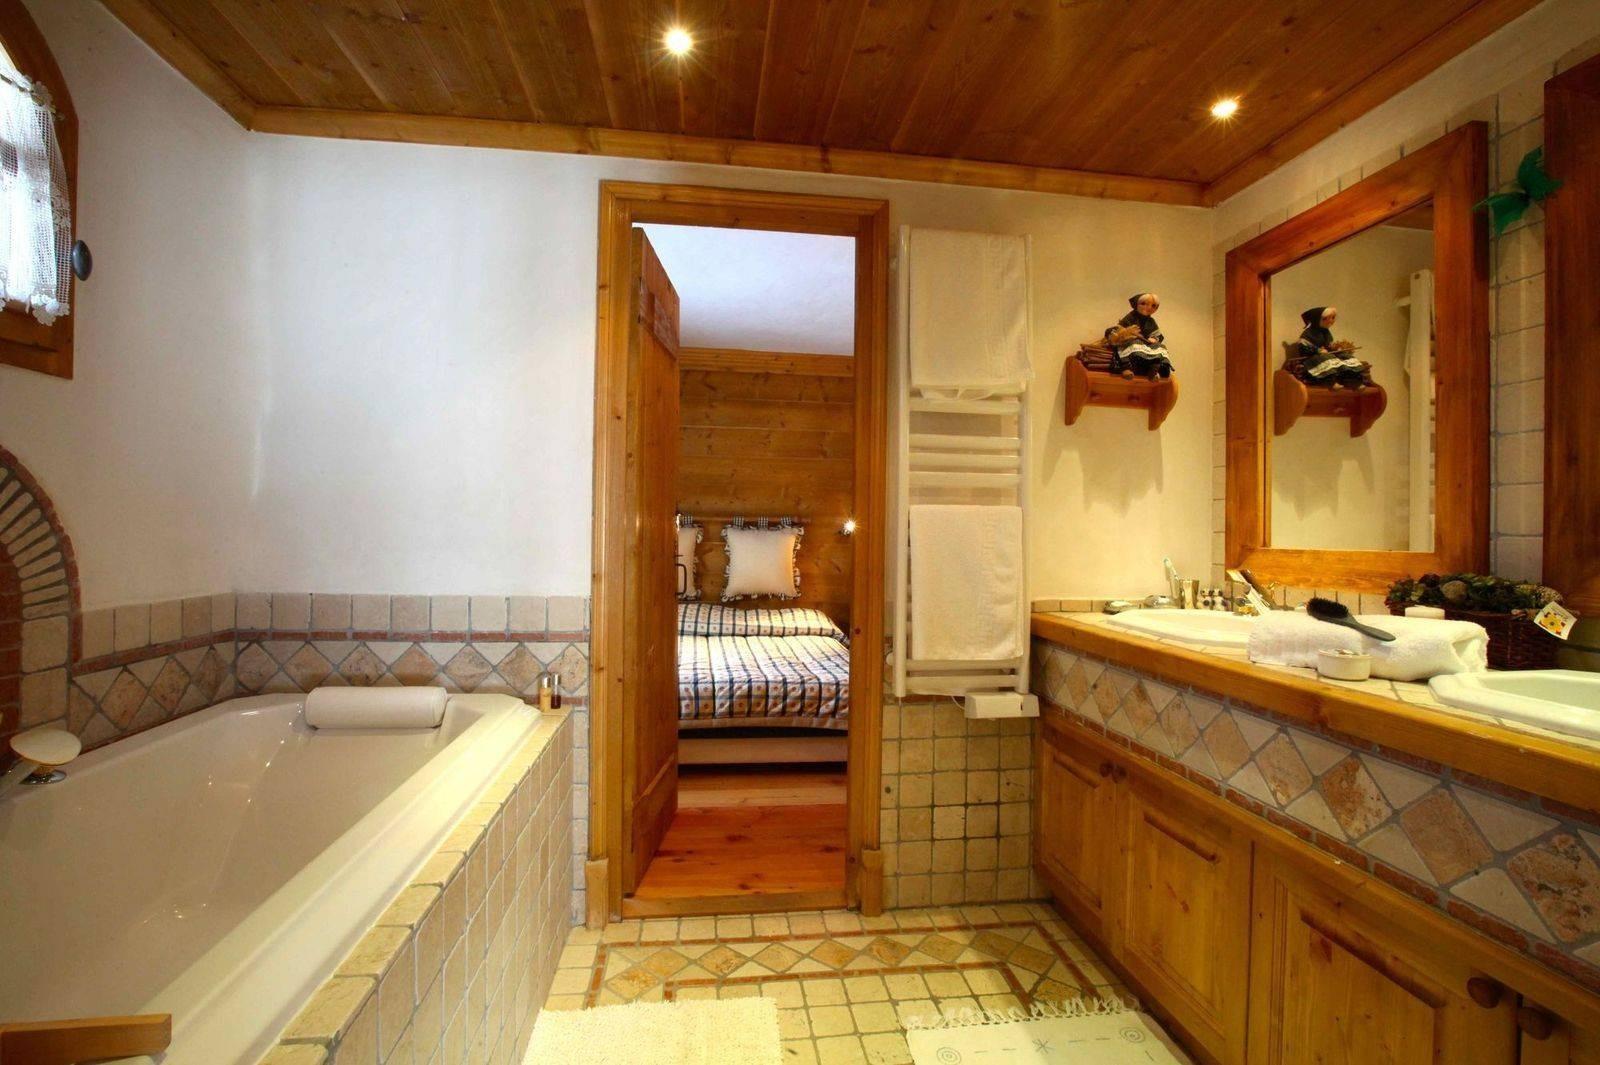 Courchevel 1850 Location Chalet Luxe Tantalite  Salle De Bain